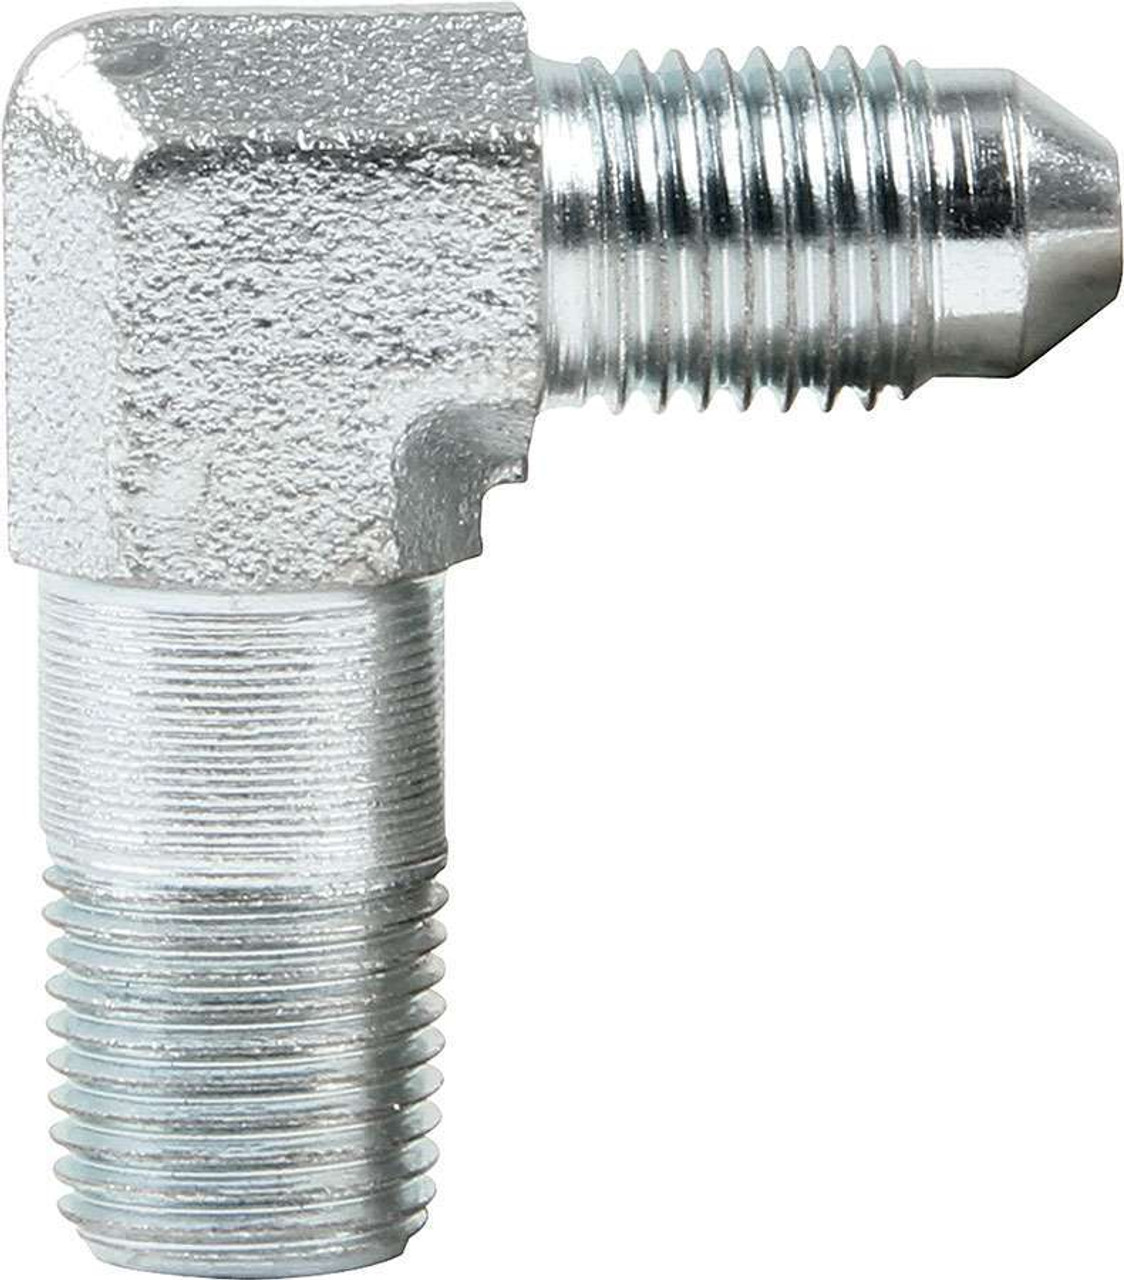 Allstar Performance ALL50011-4 to 1//8 NPT 45 Degree Adapter Fitting